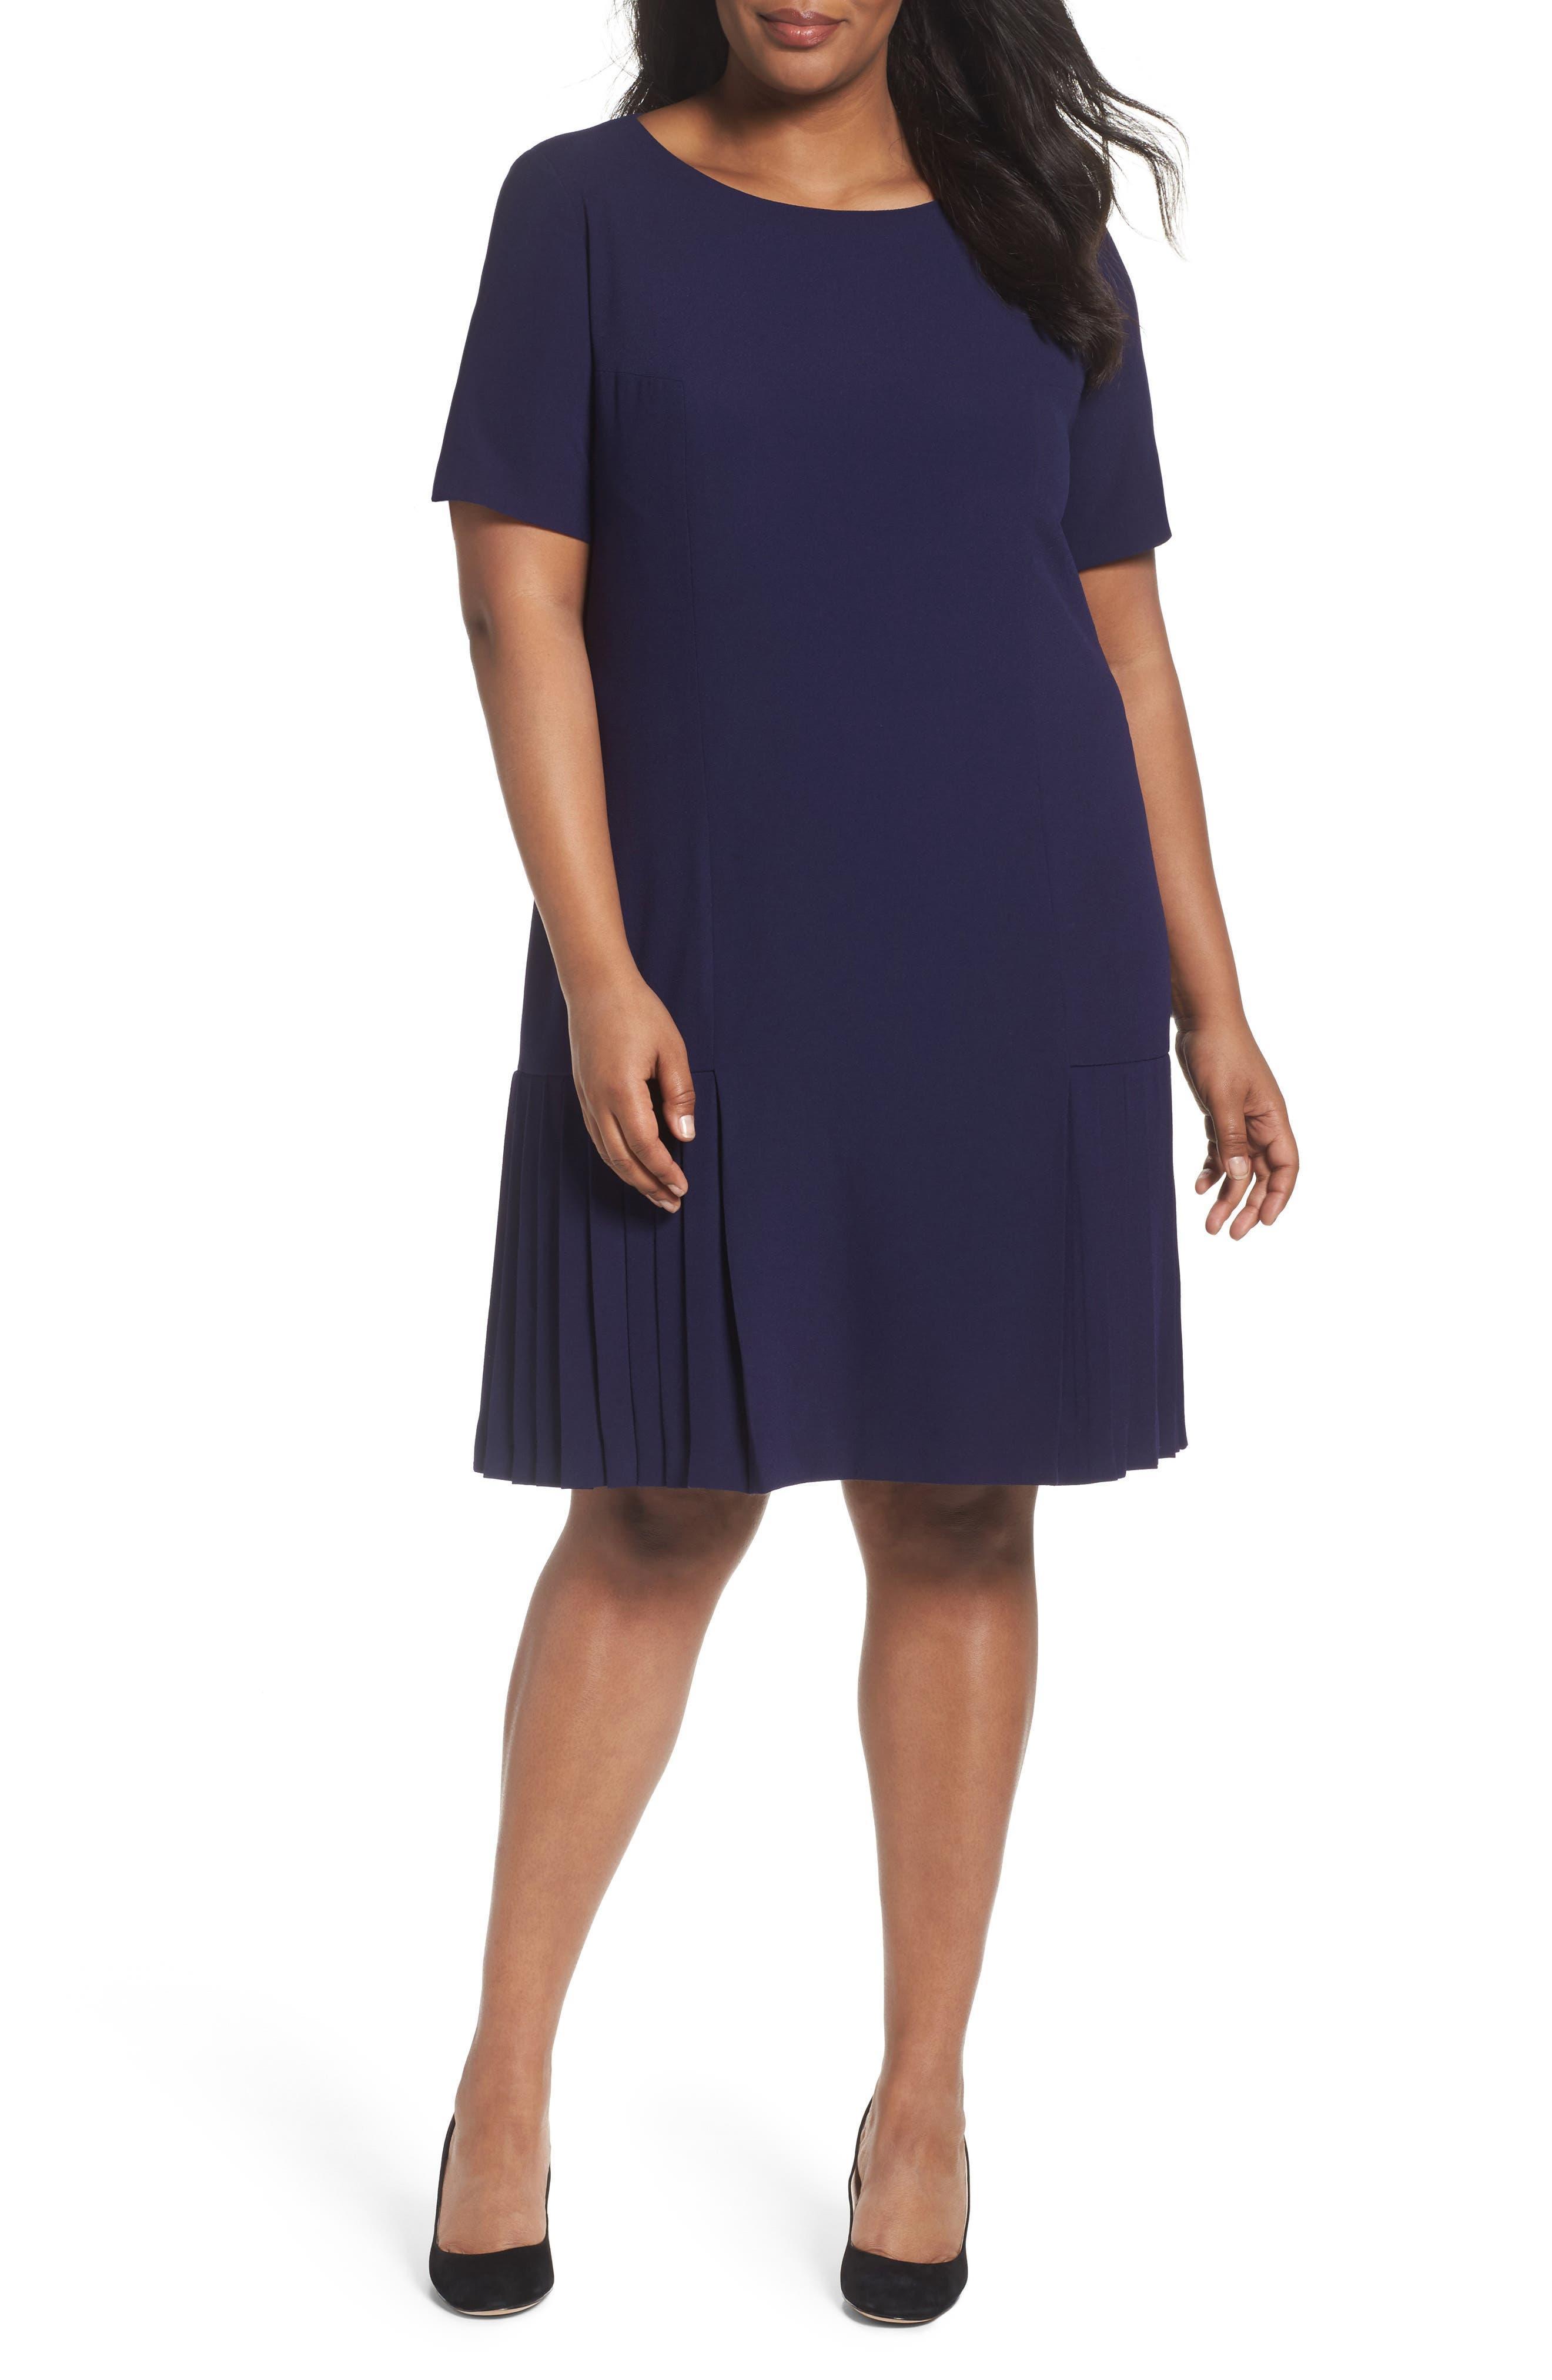 Tahari Pleat Crepe A-Line Dress (Plus Size)